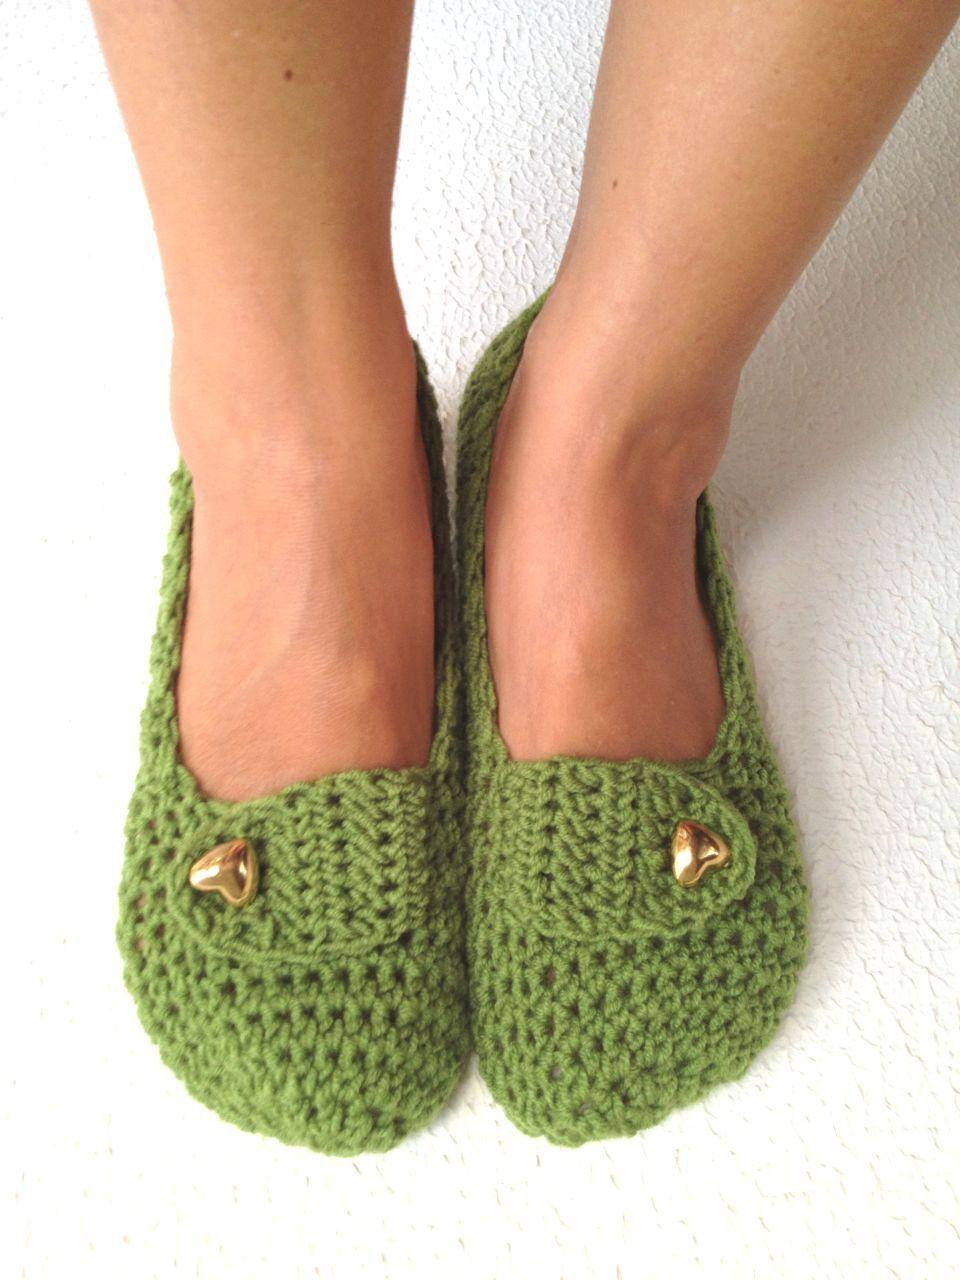 crochet womens slippers ballet flats house shoes 25 00 via etsy